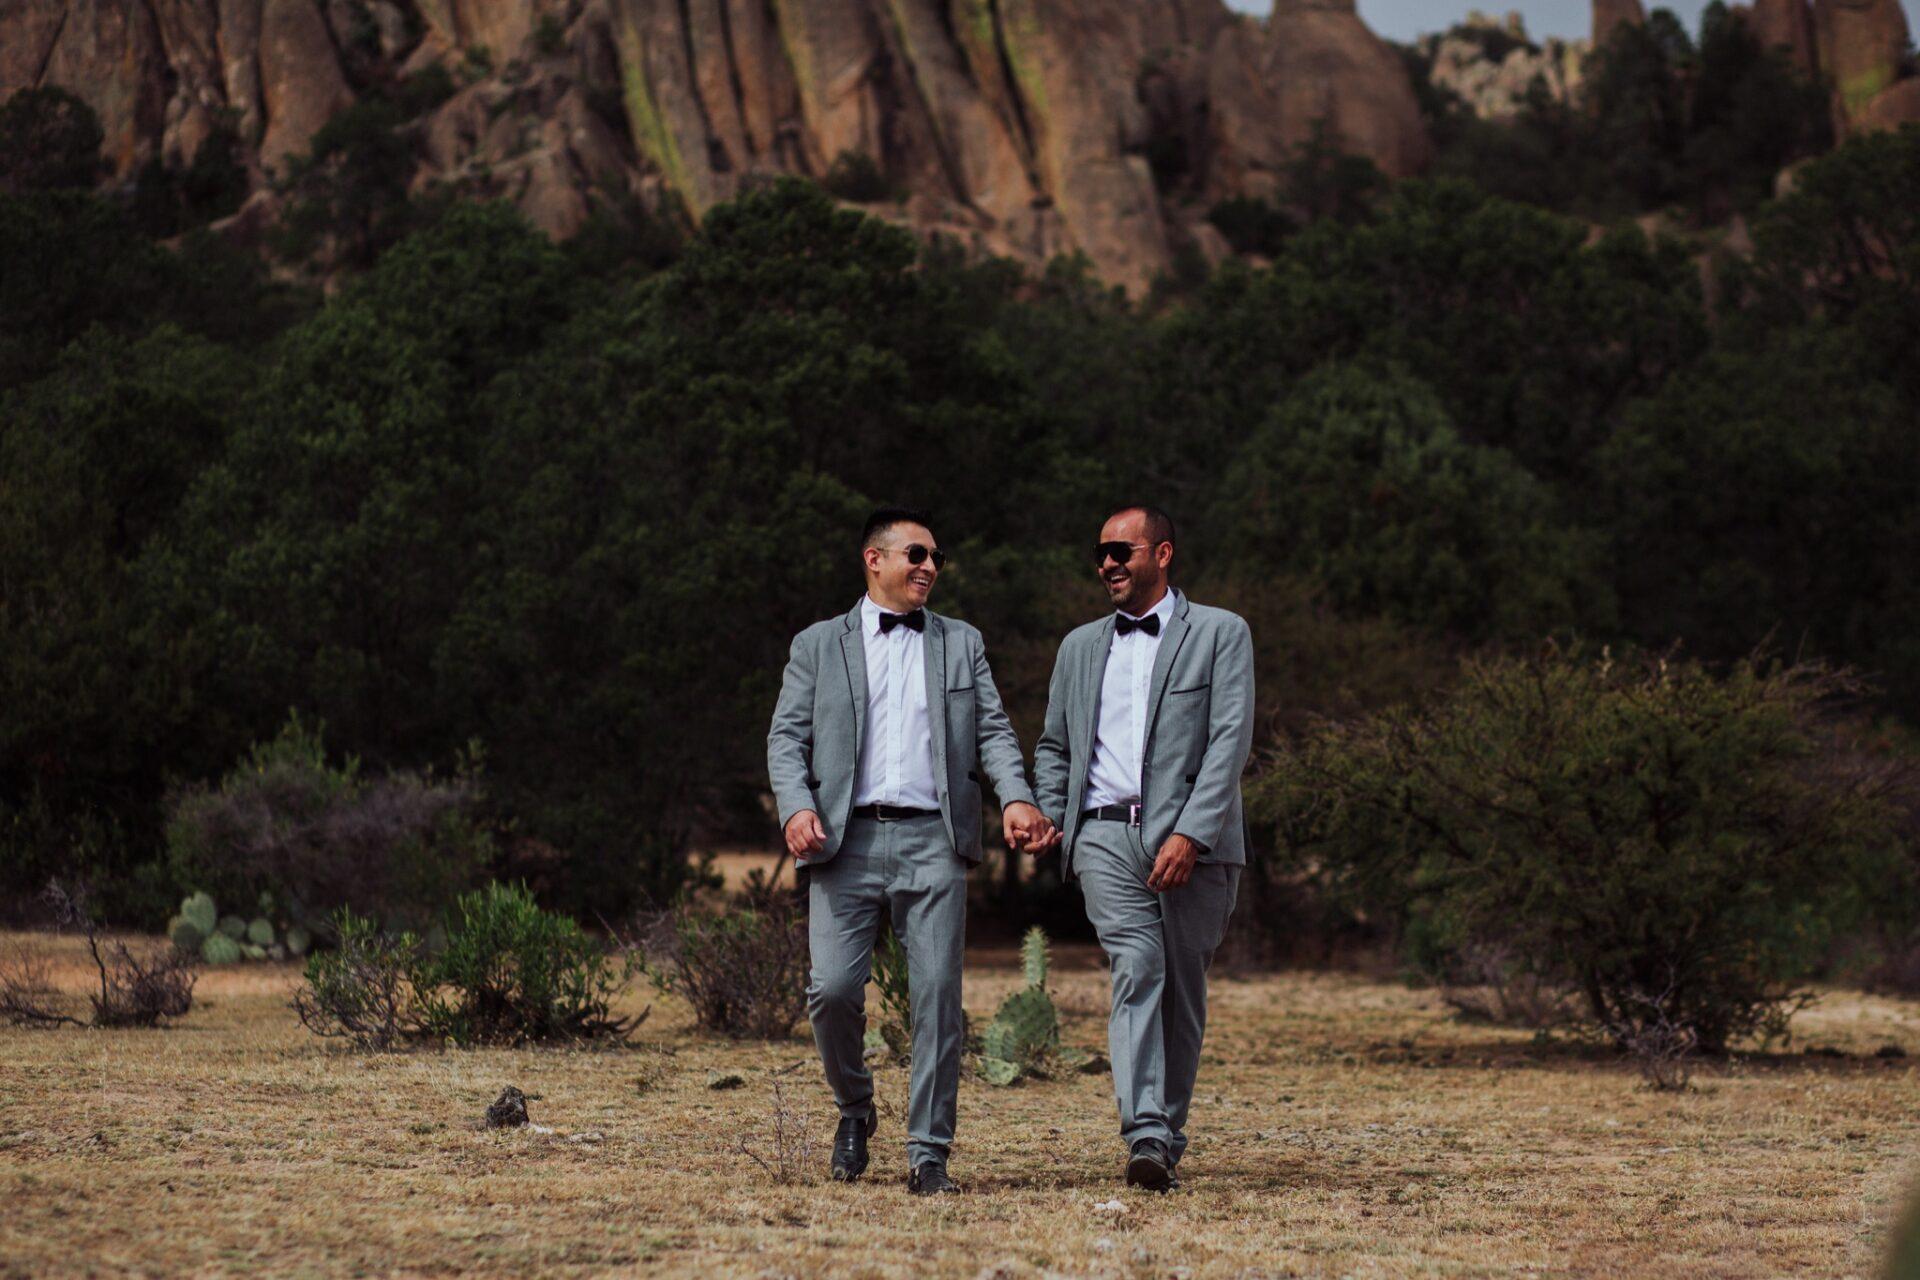 javier_noriega_fotografo_bodas_save_the_date_preboda_zacatecas_wedding_photographer7